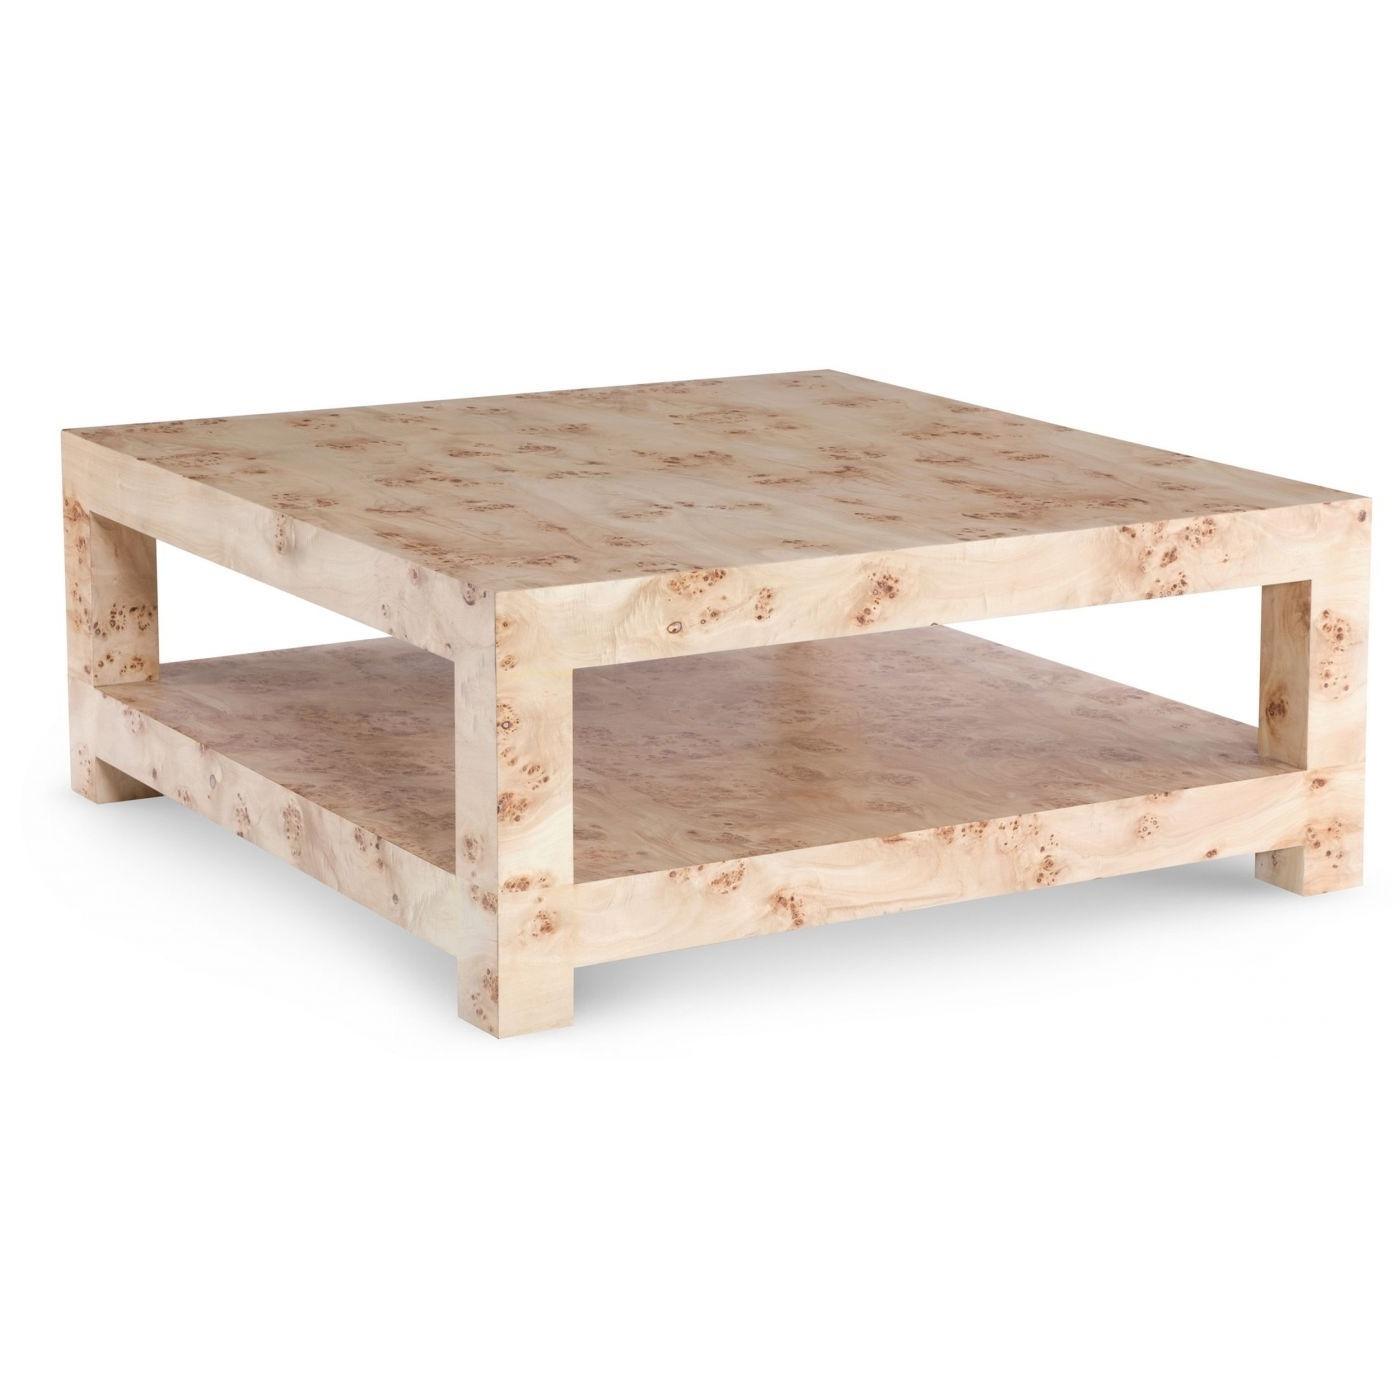 Bi Level Square Coffee Table In Mapa Burl Wood Vaneer (View 5 of 20)